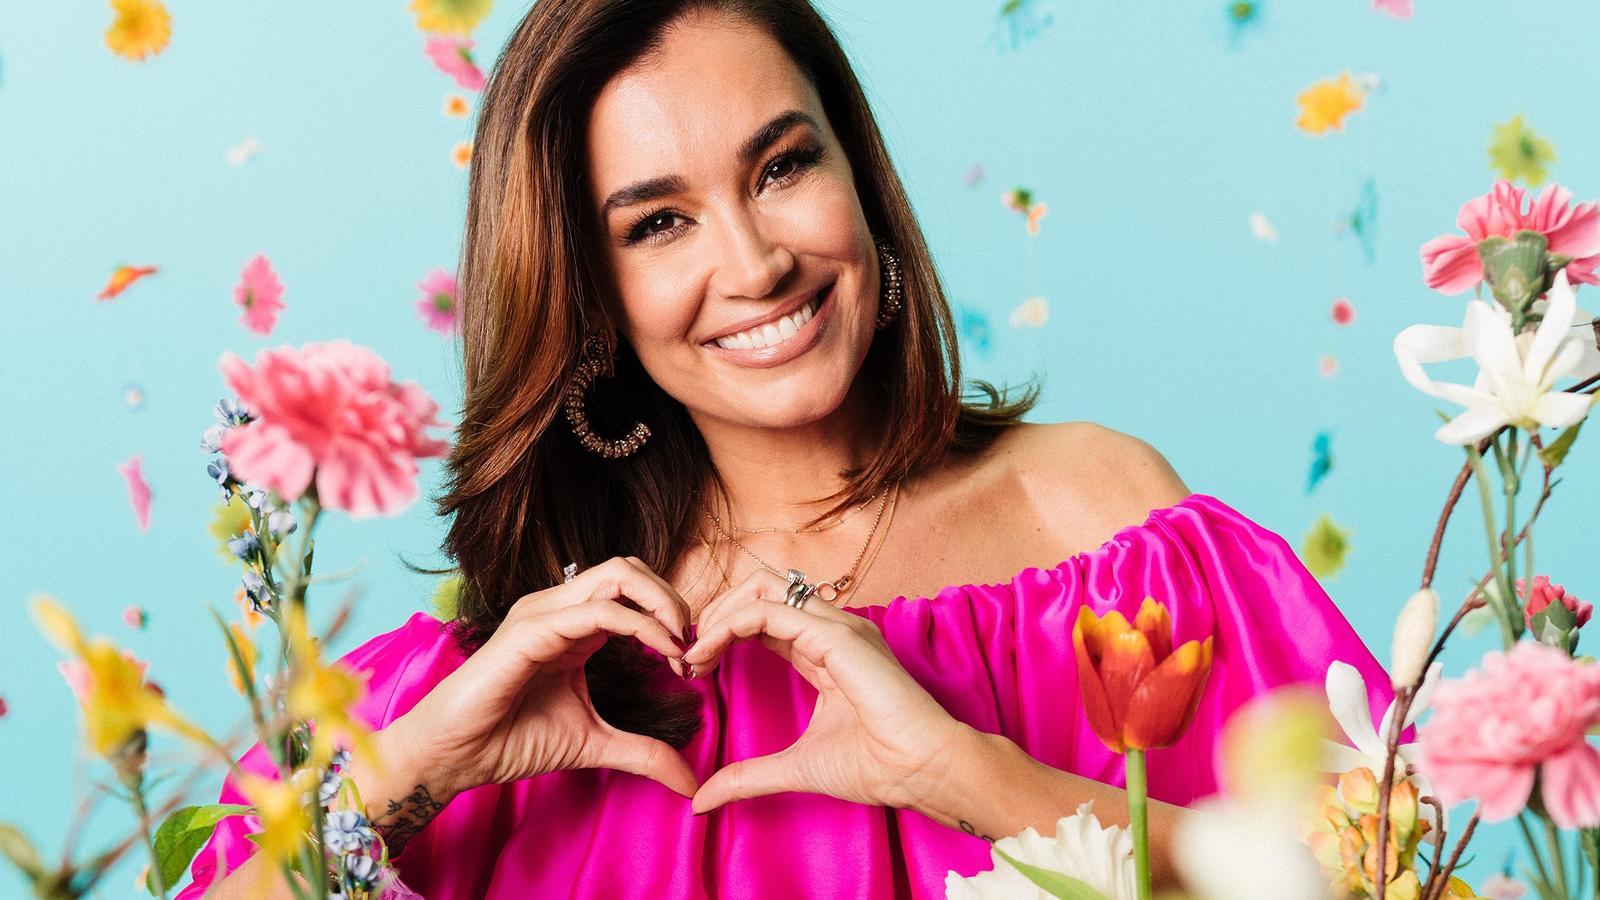 Love Island 2021: Jana Ina Zarrella enthüllt erste Neuerungen